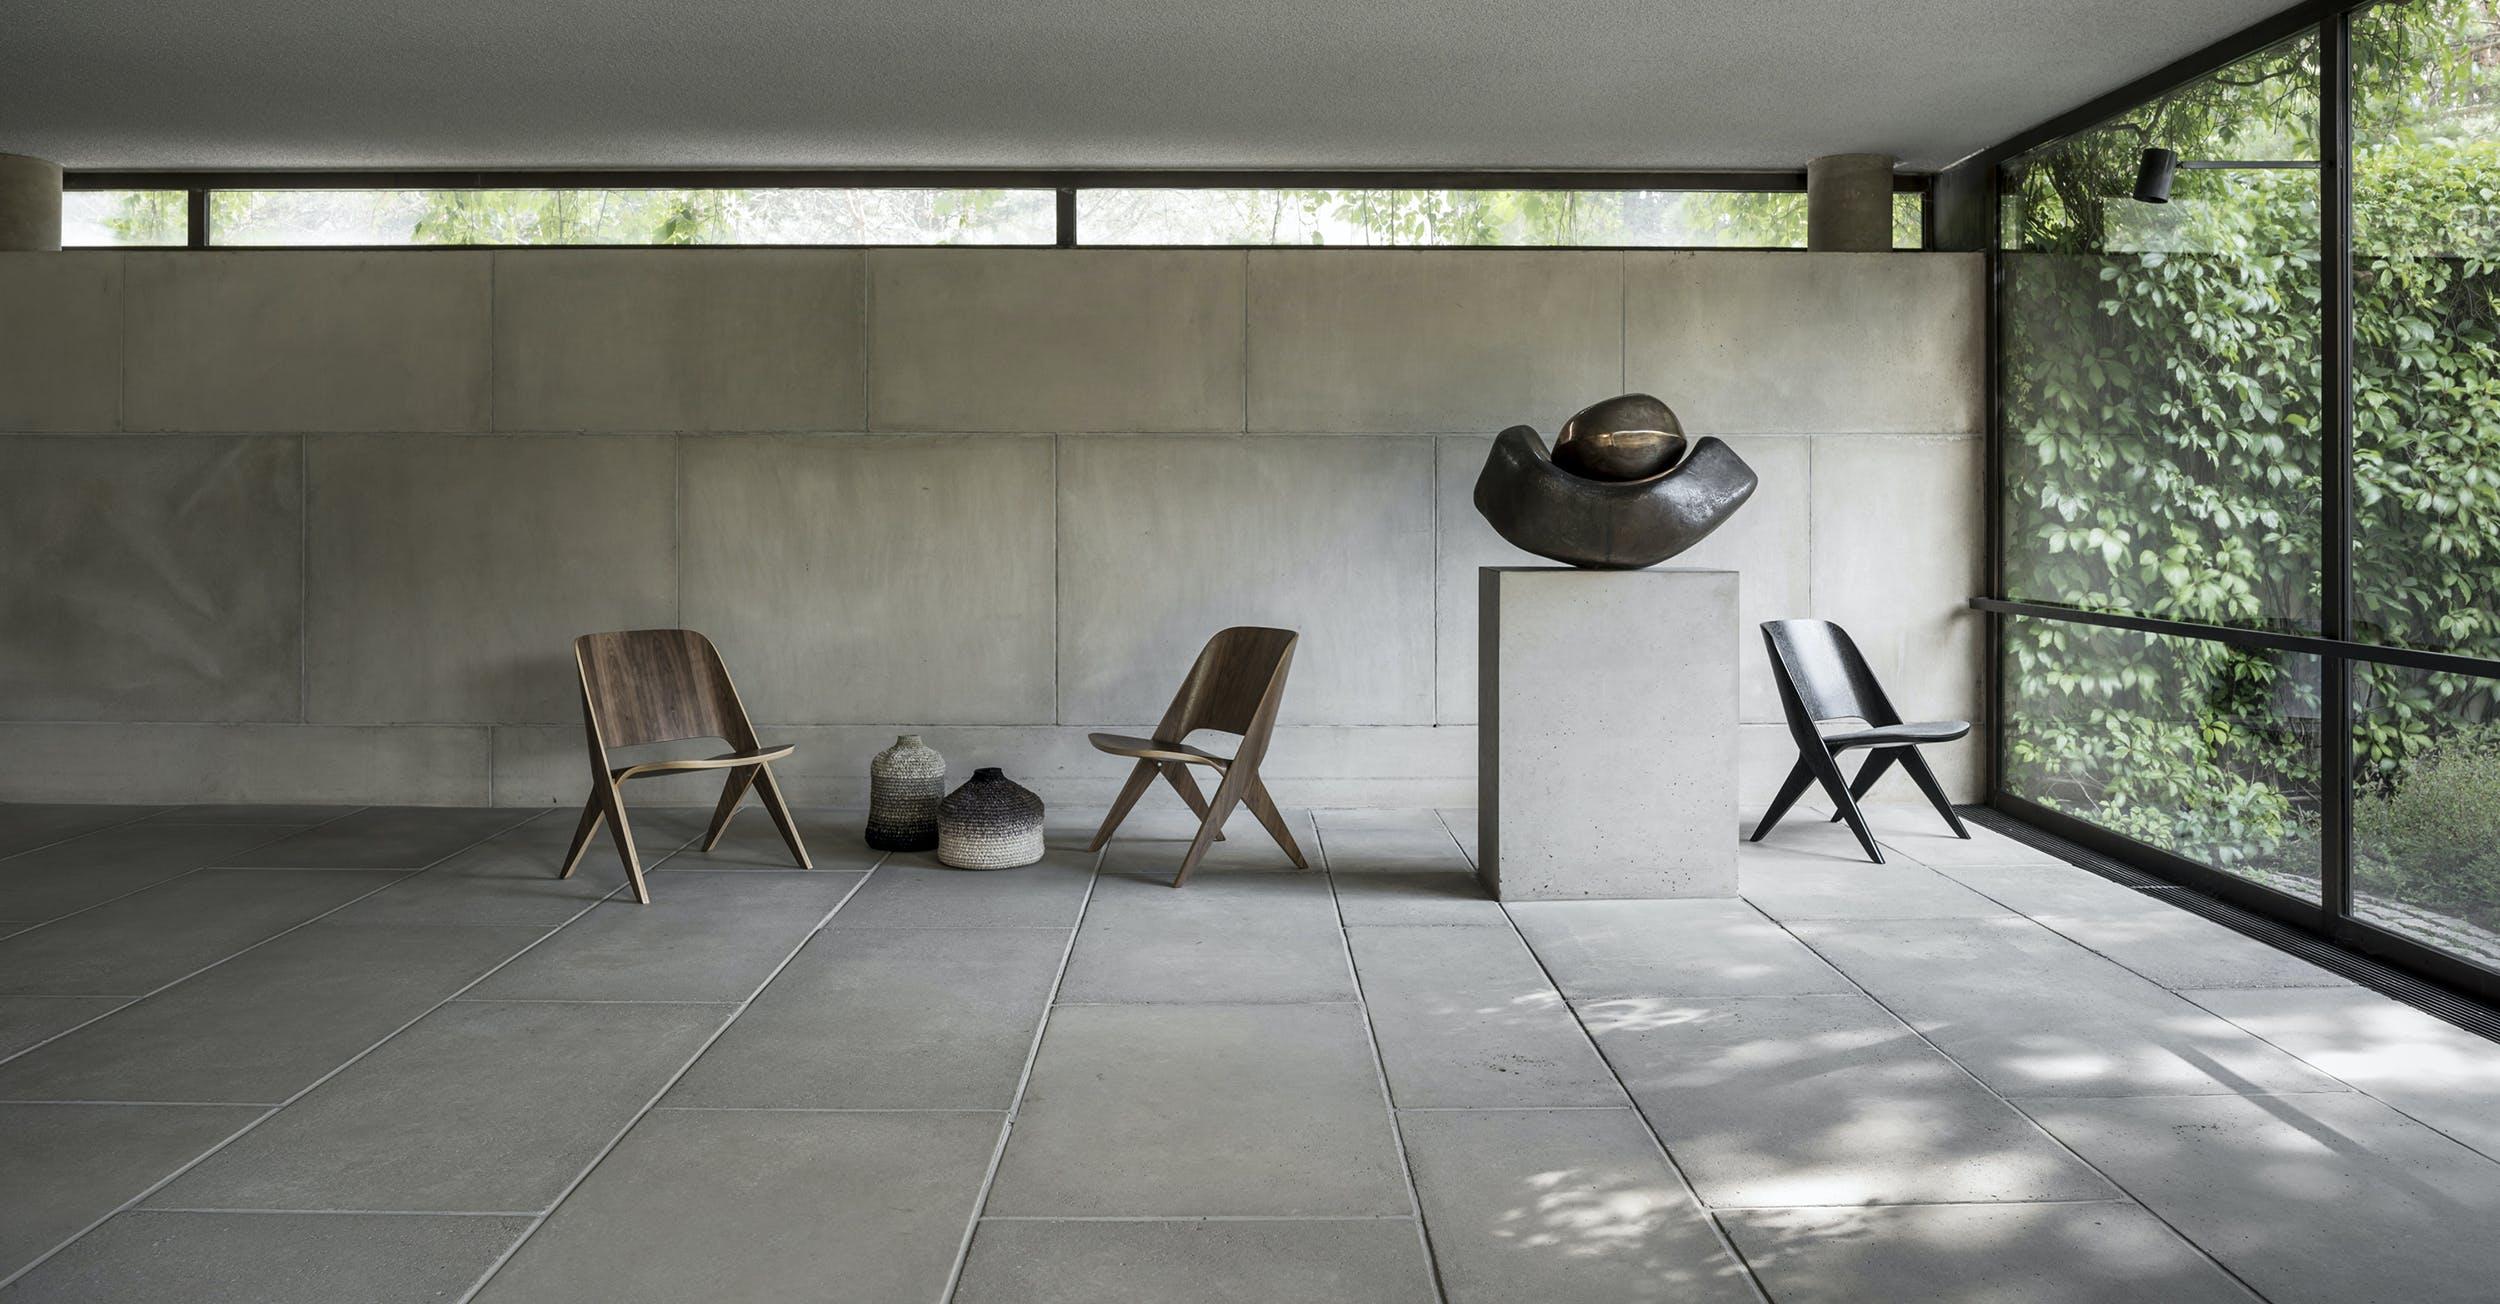 Poiat Lavitta Lounge Int 5 Small